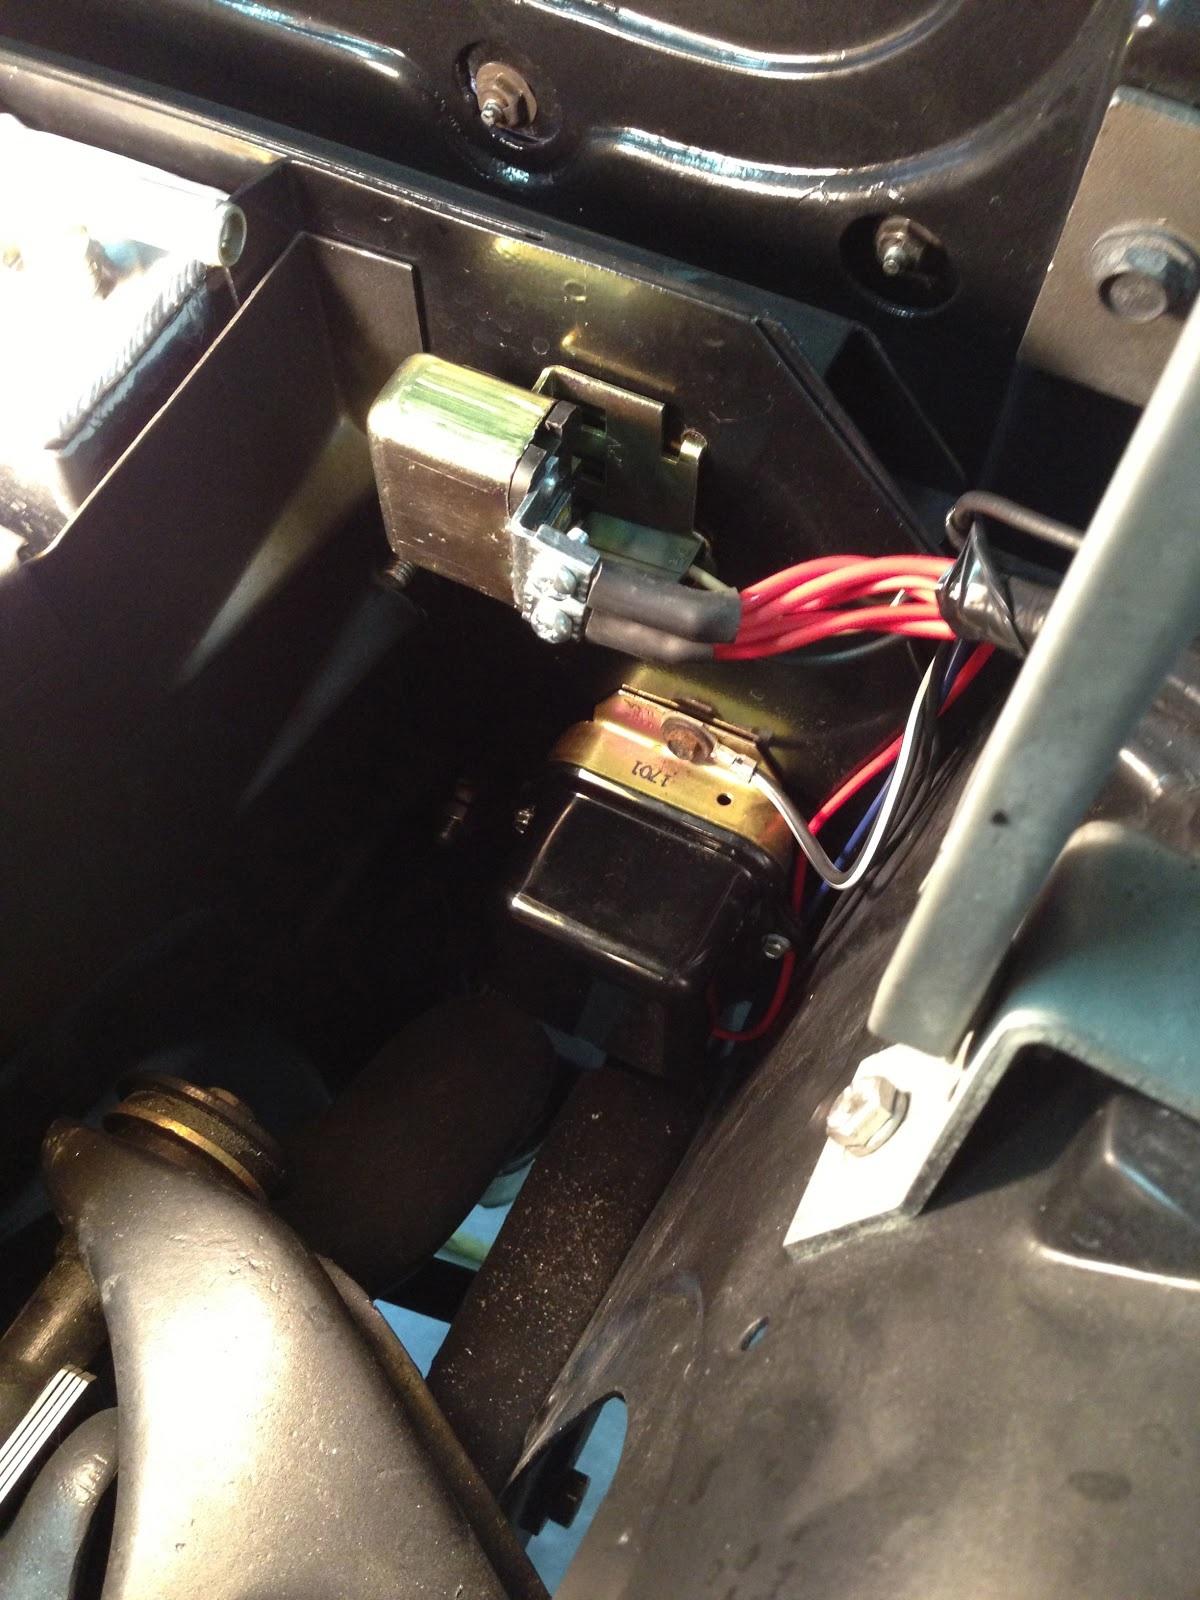 hight resolution of here is headlight relay wiring diagram corvetteforum chevrolet 2001 corvette headlight motor wiring diagram